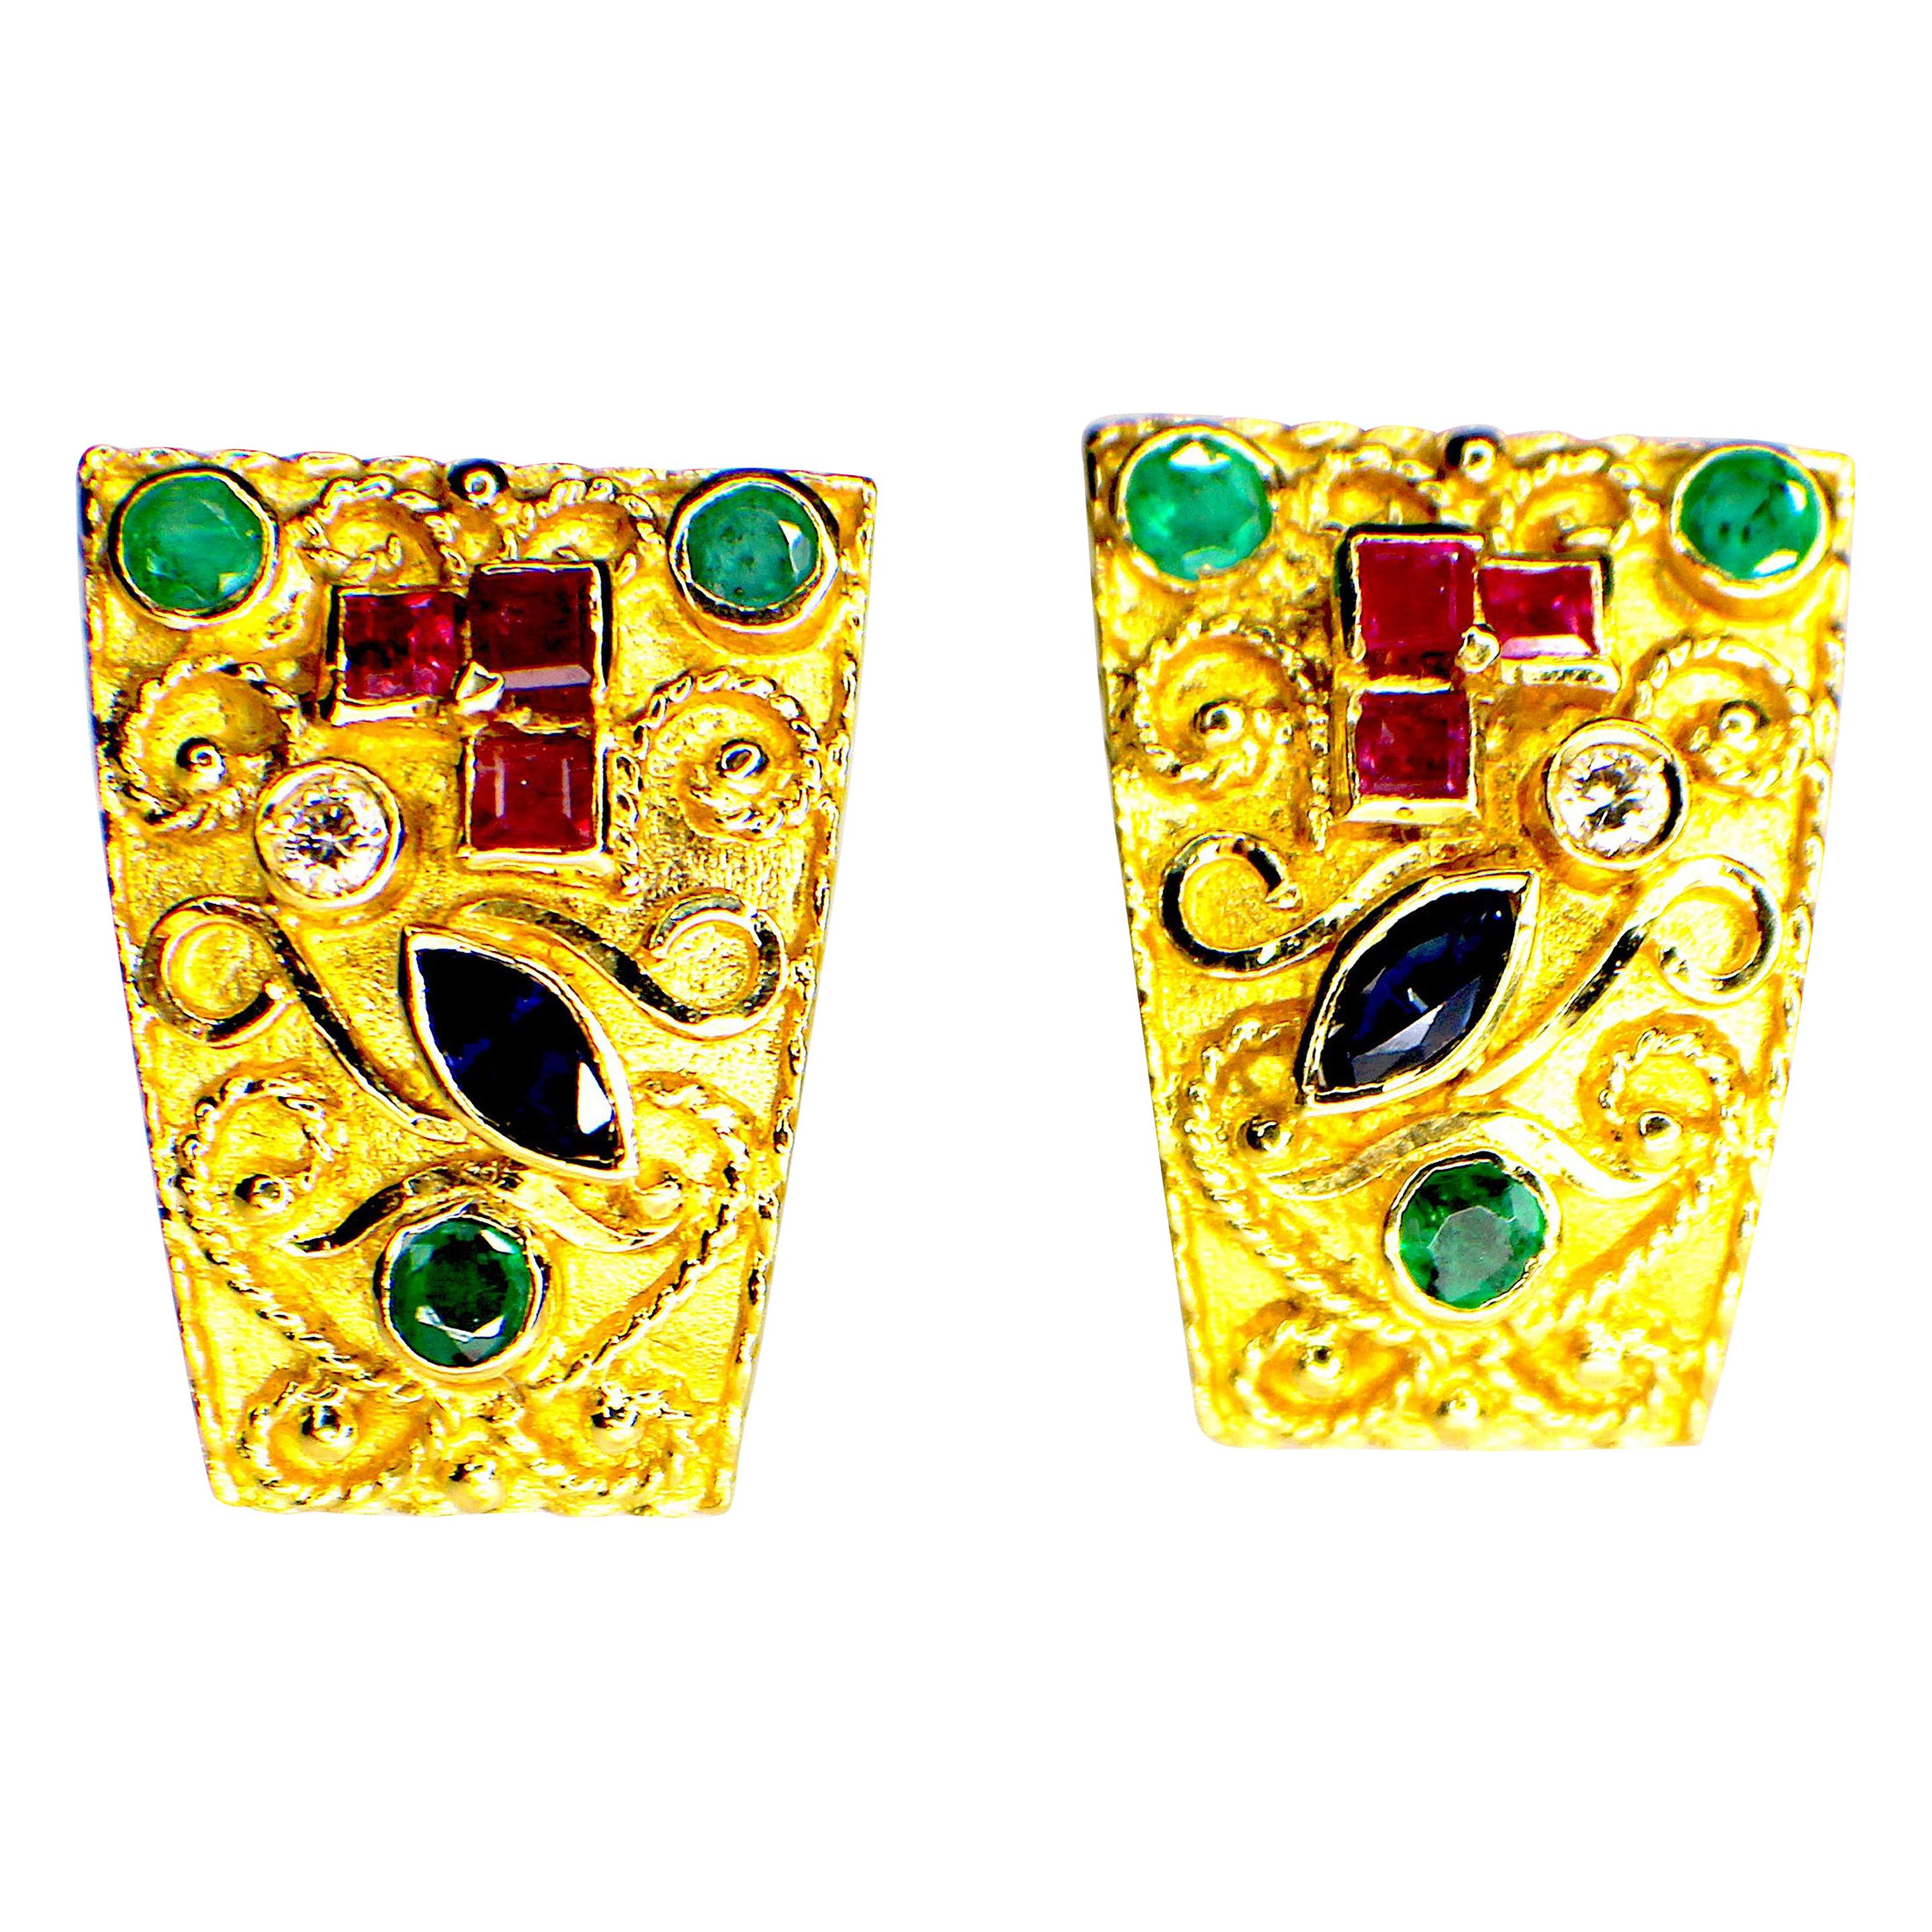 Gemolithos Byzantine Style, Handcrafted, Gem Set Earrings, 1970s-1980s